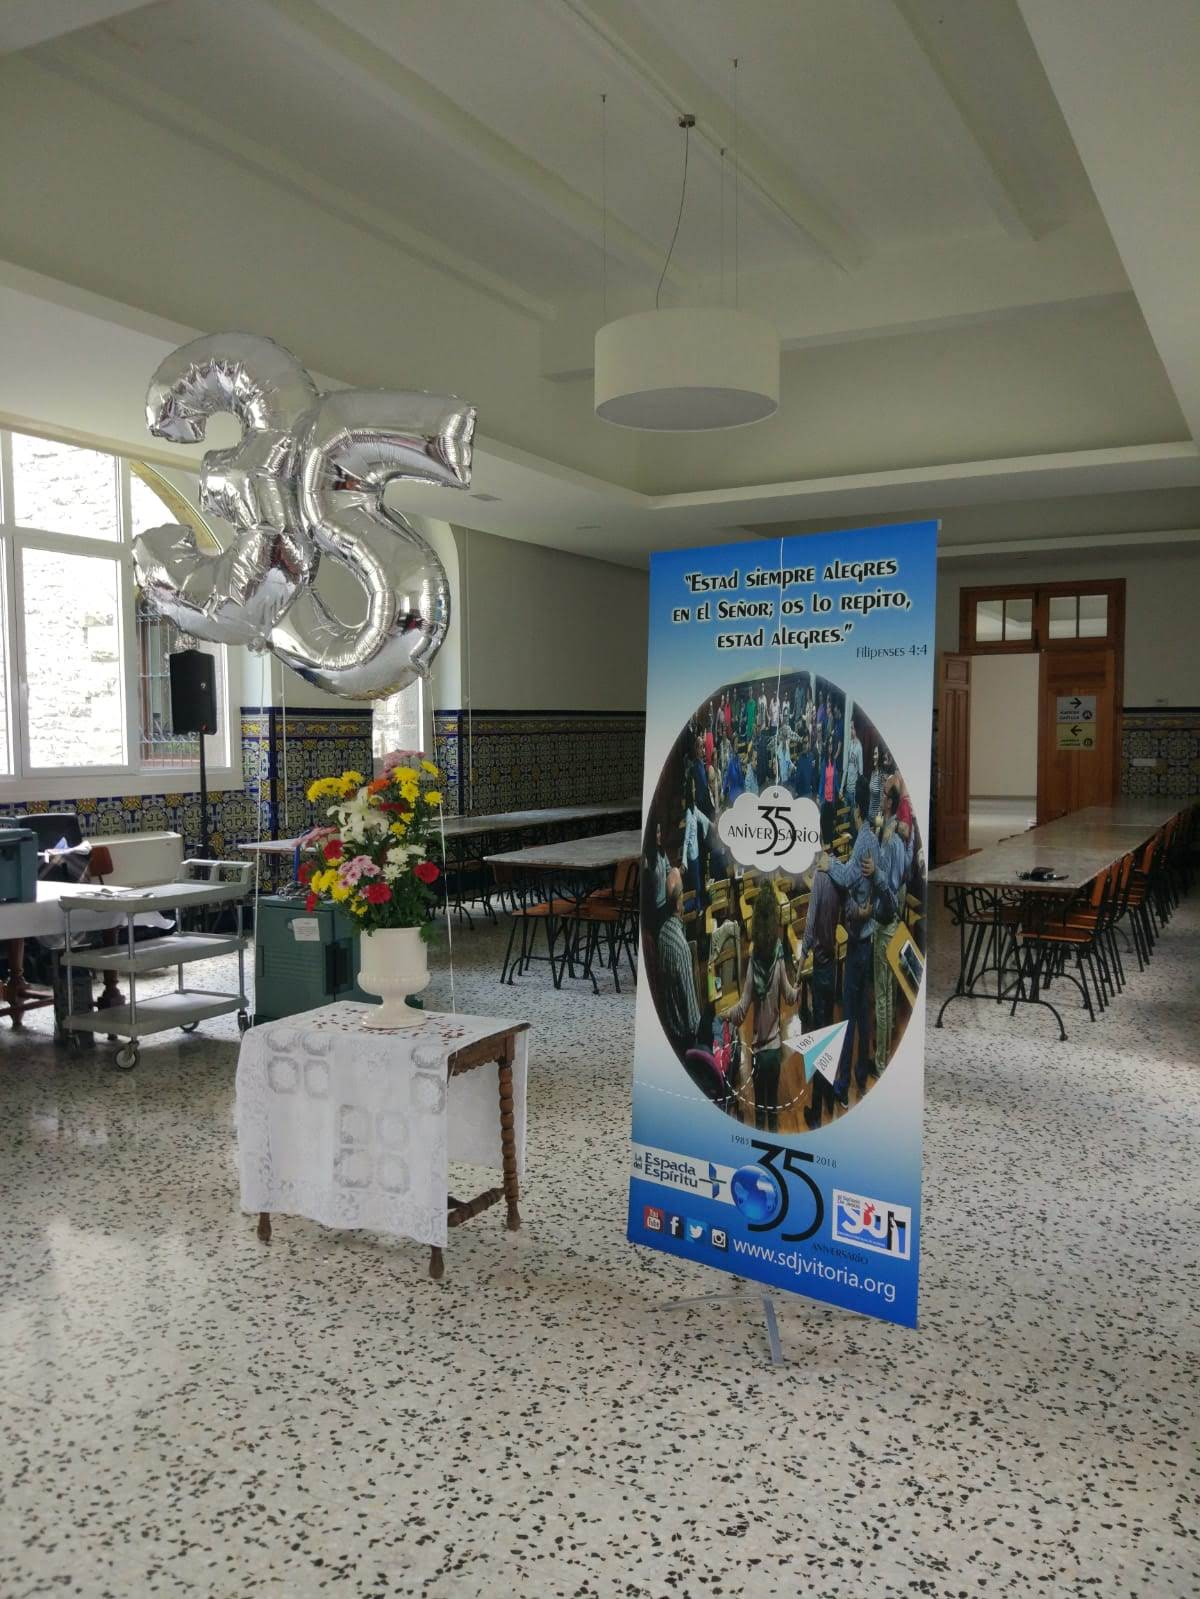 2018.06.17 - 35 Aniversario SDJ (86c)